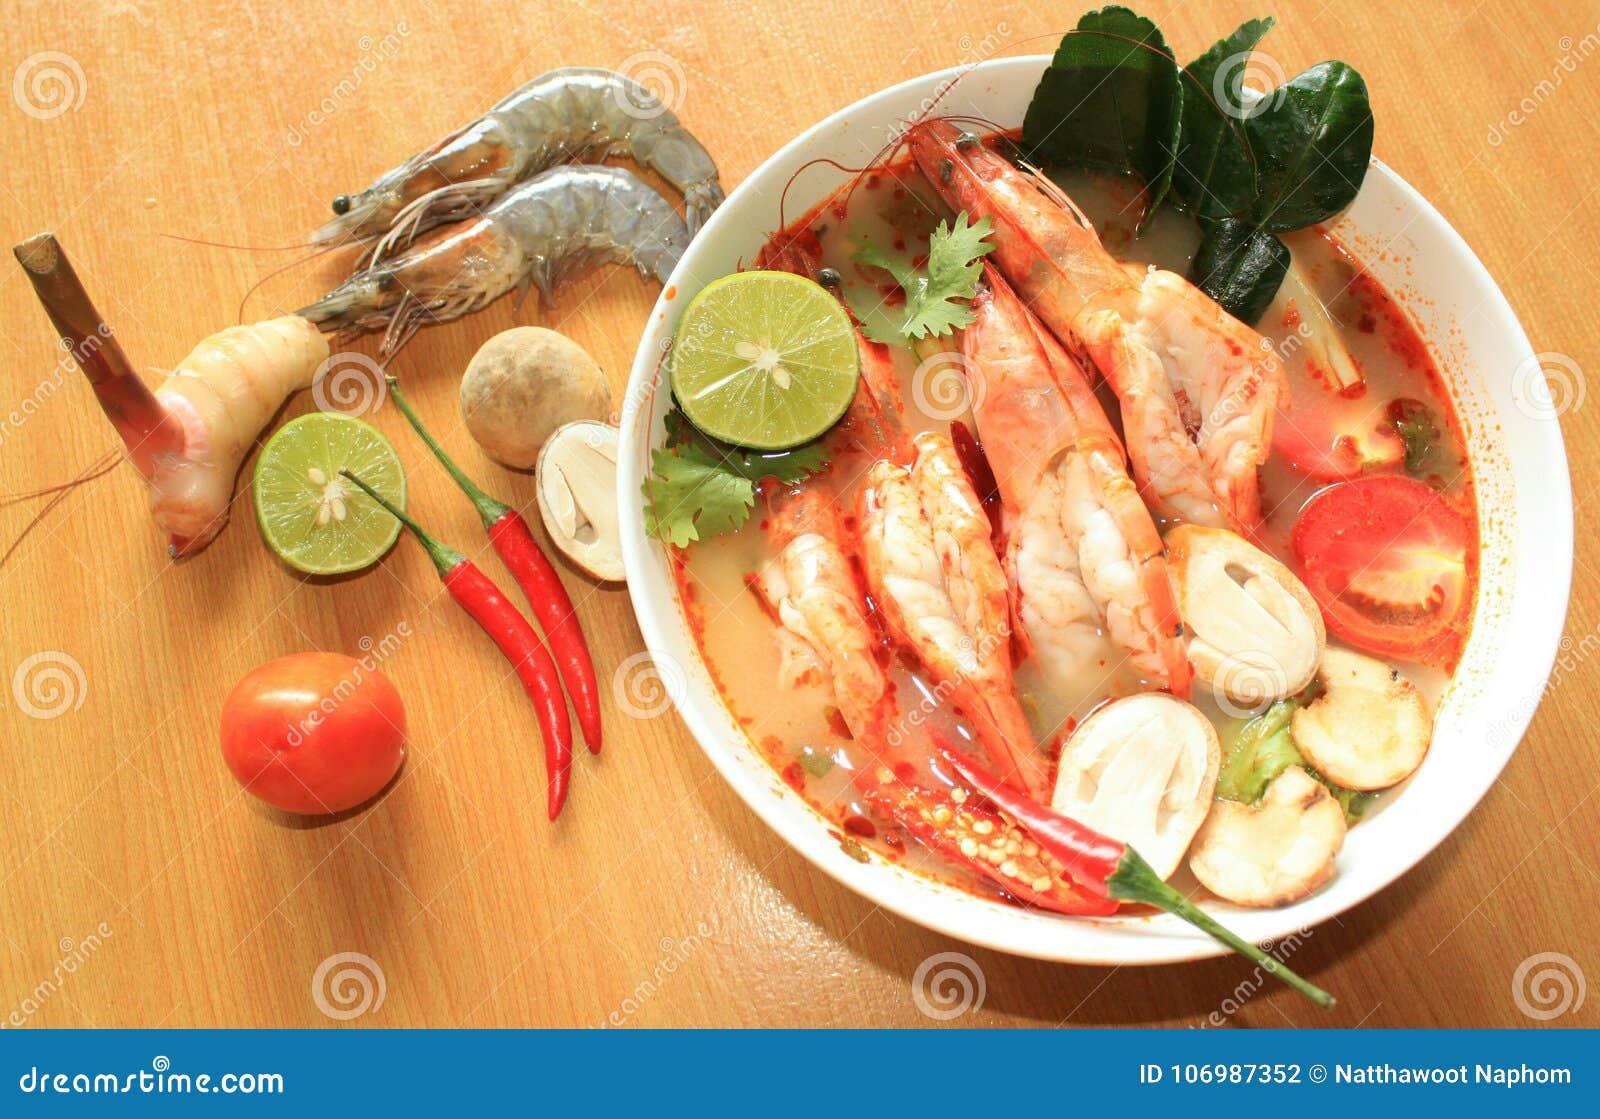 Goong πικάντικο αρσενικό (ζώο) σούπας γαρίδων yum